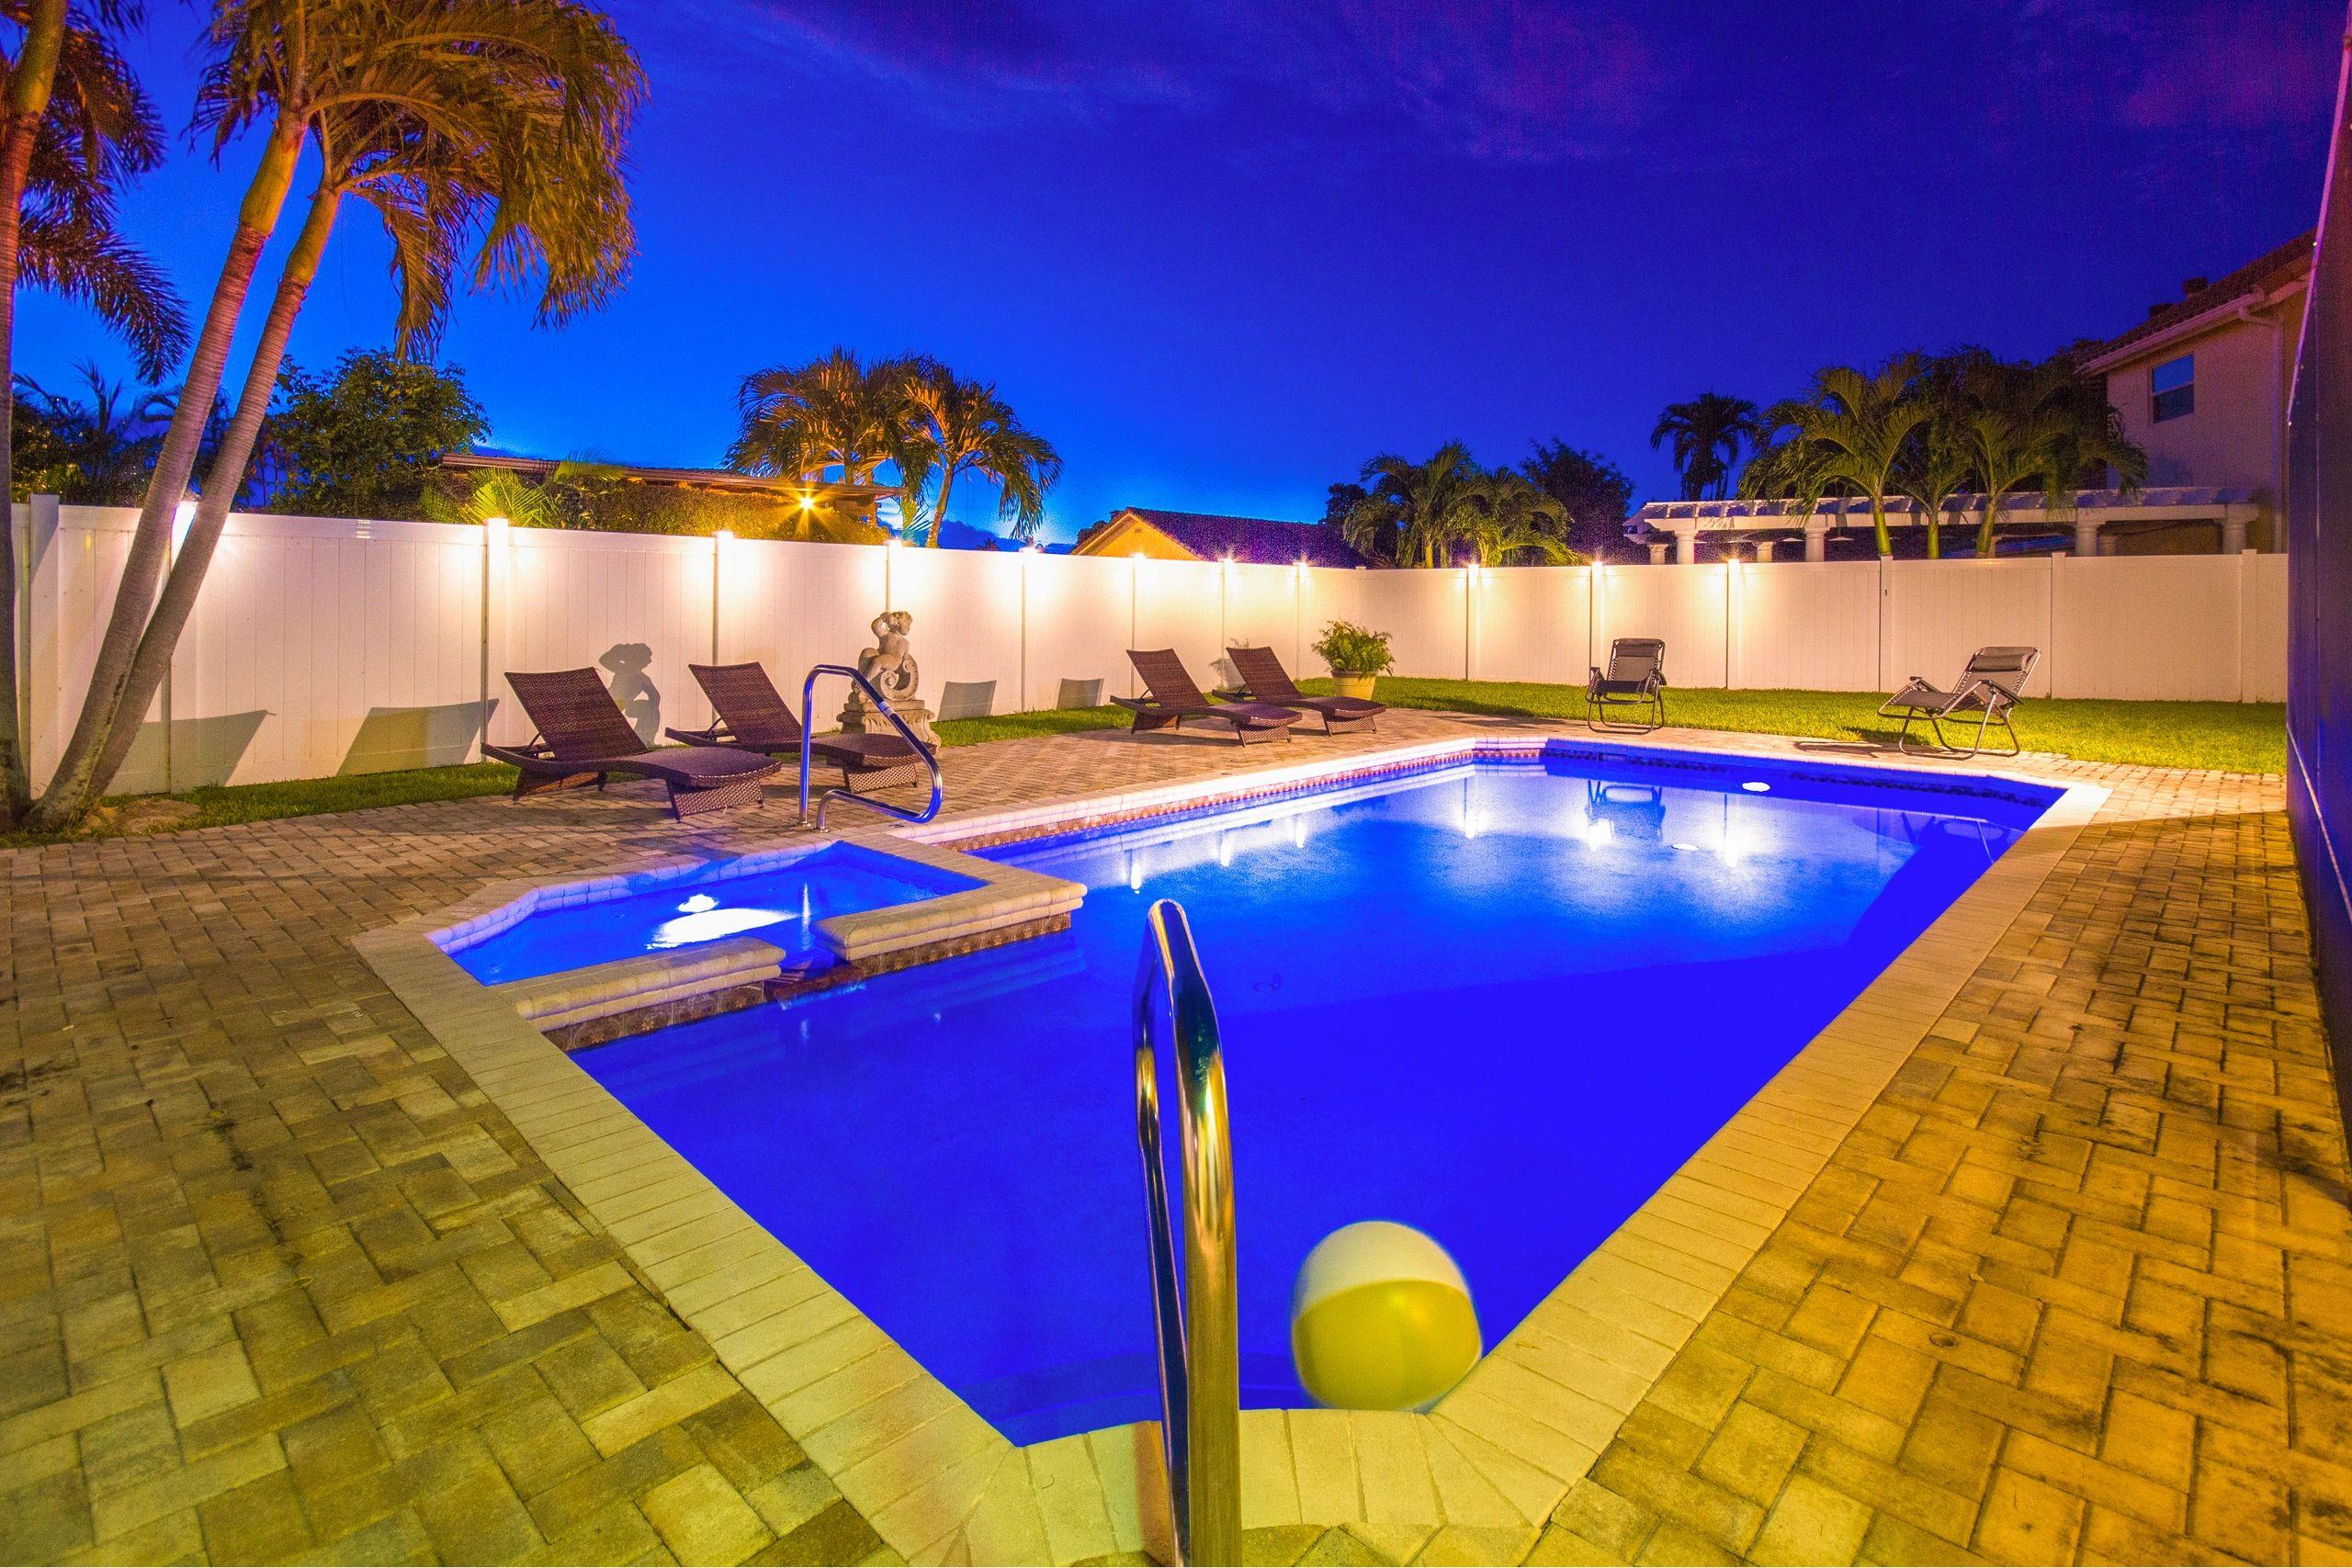 Boca kosher home vacation rental for Kosher home